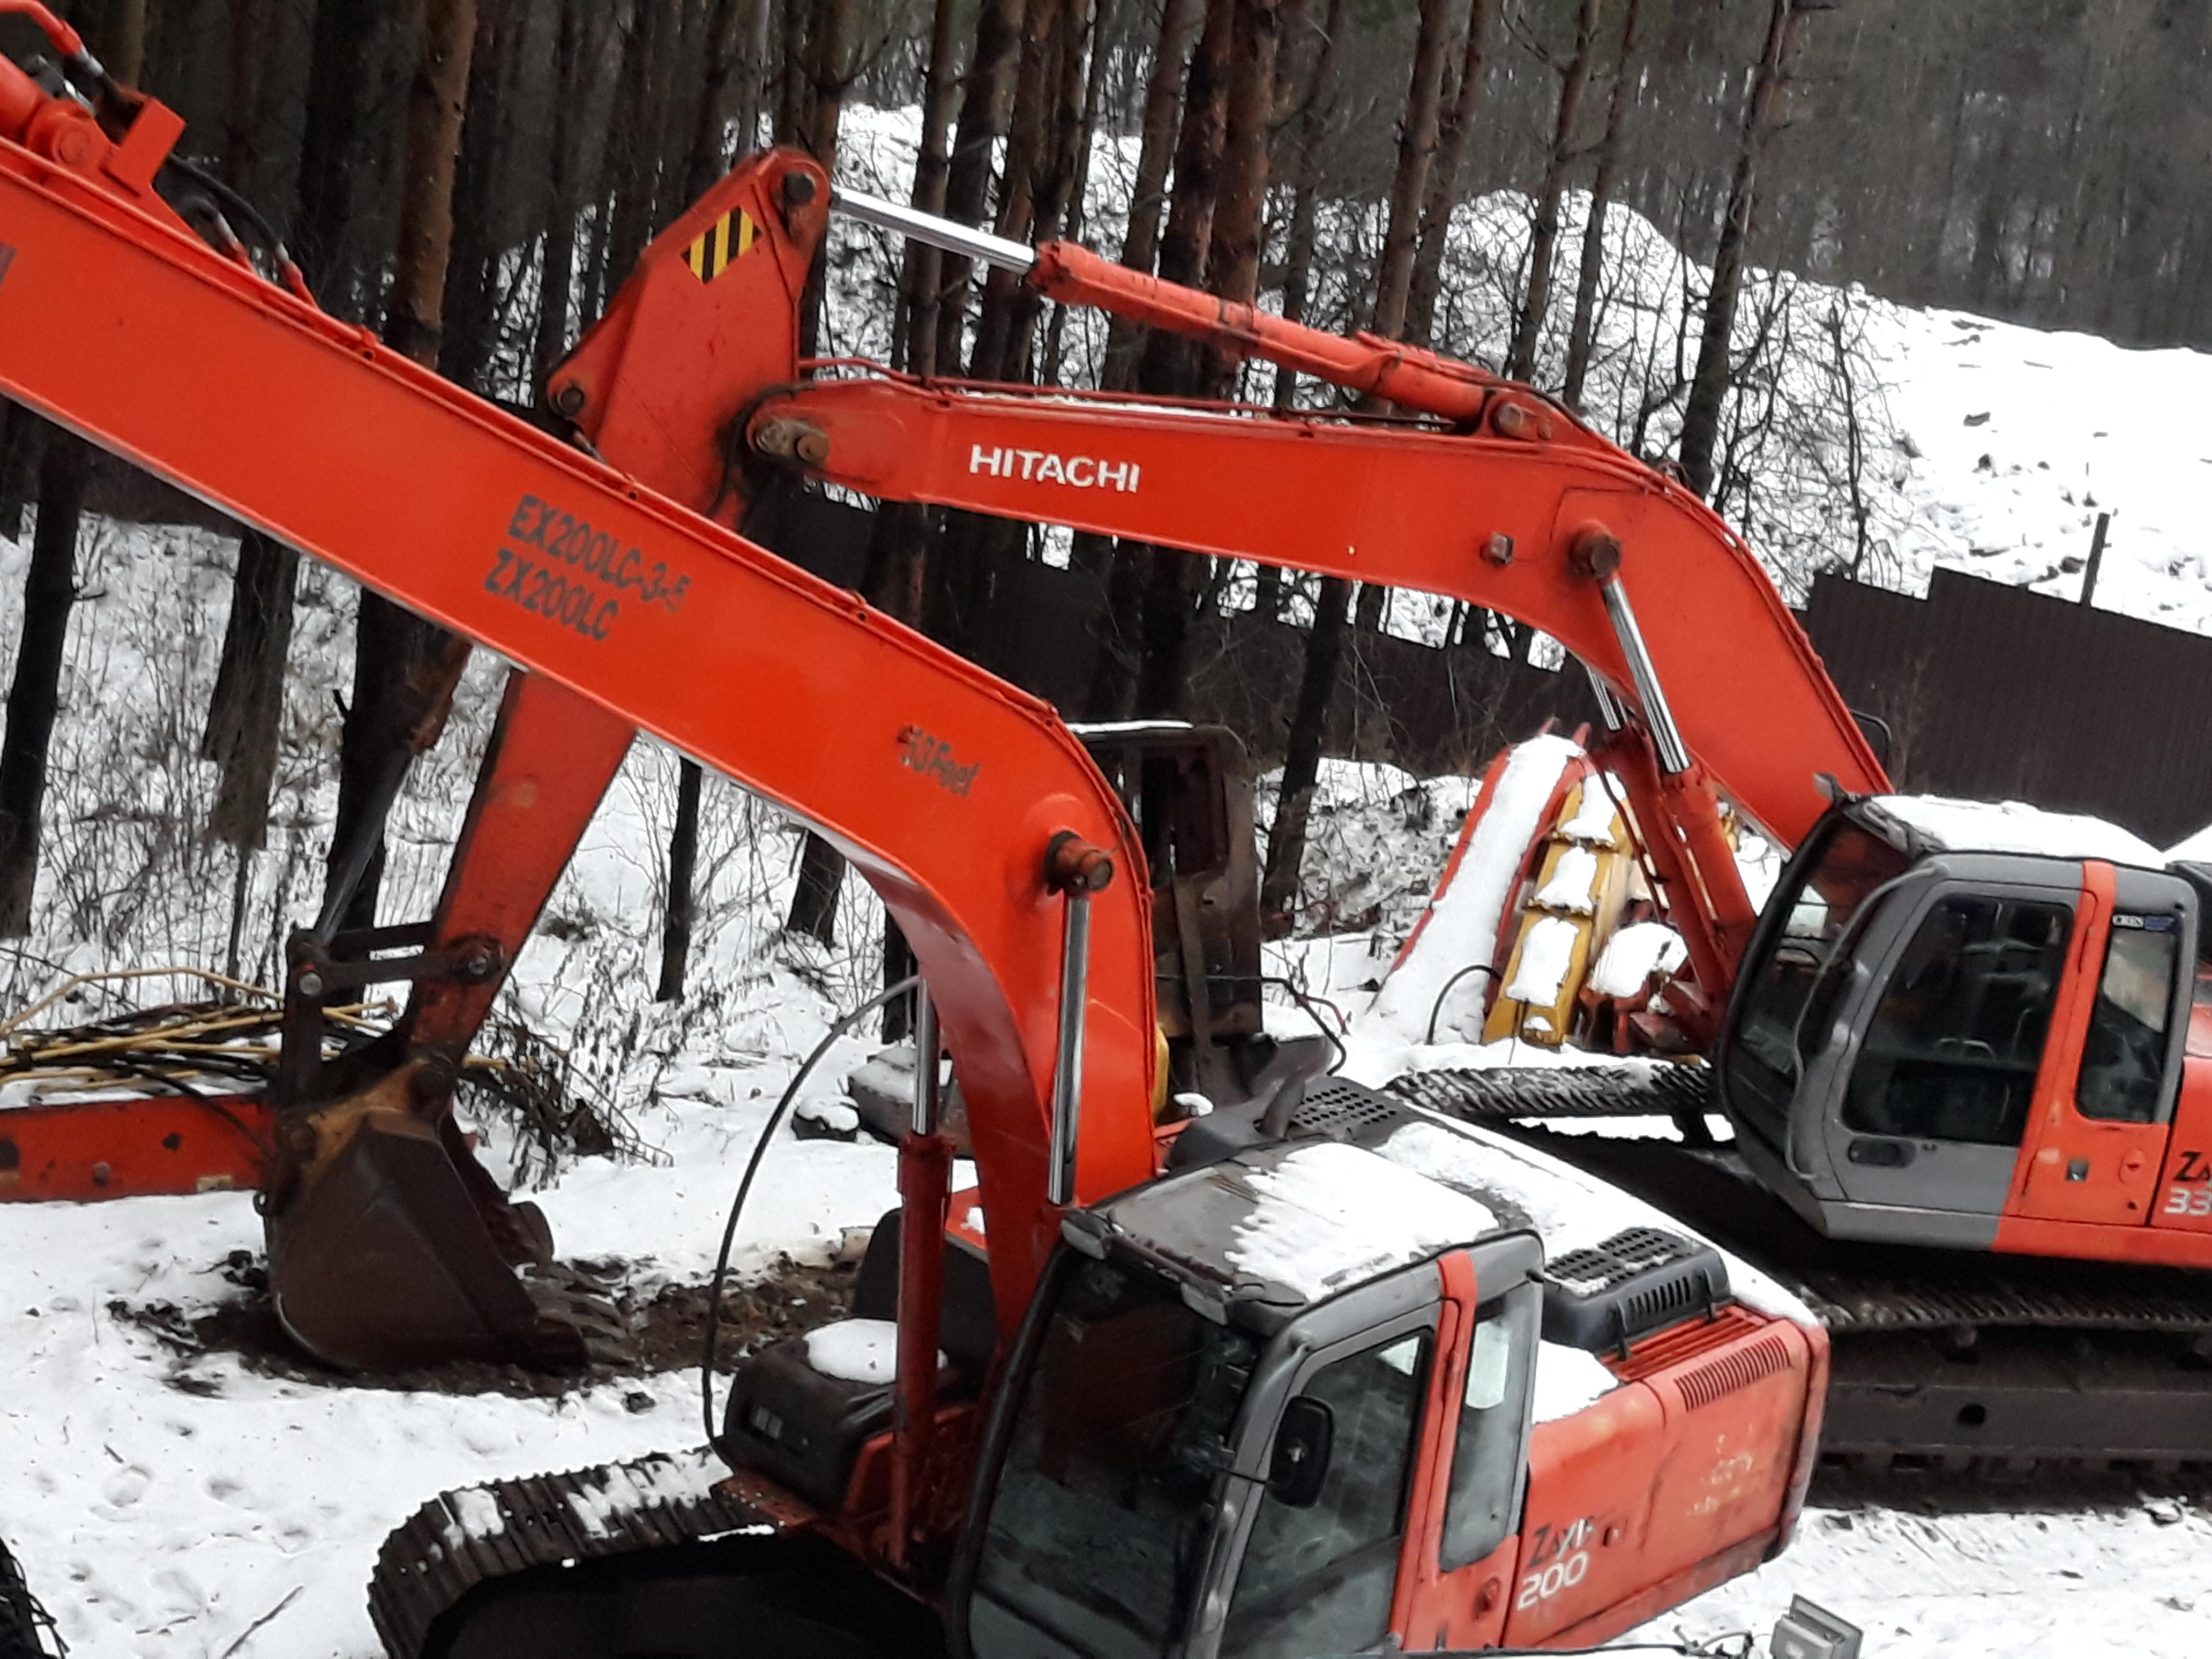 Рукоять ковш двигатель кабина Хитачи Hitachi Jcb Komatsu б/у